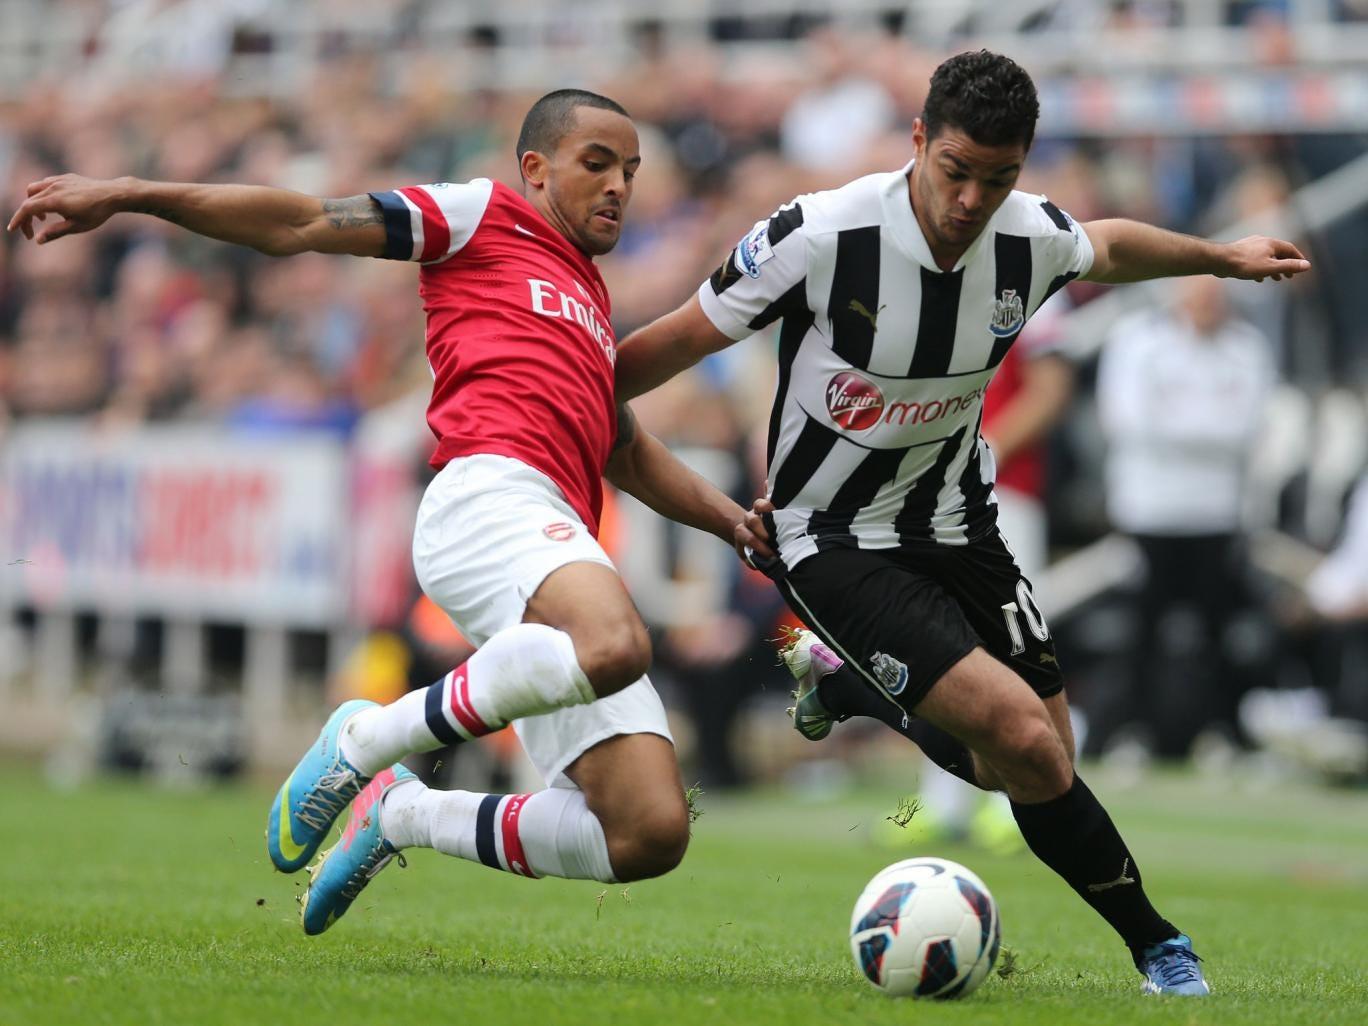 Hatem Ben Arfa (right) has impressed at Newcastle despite injury